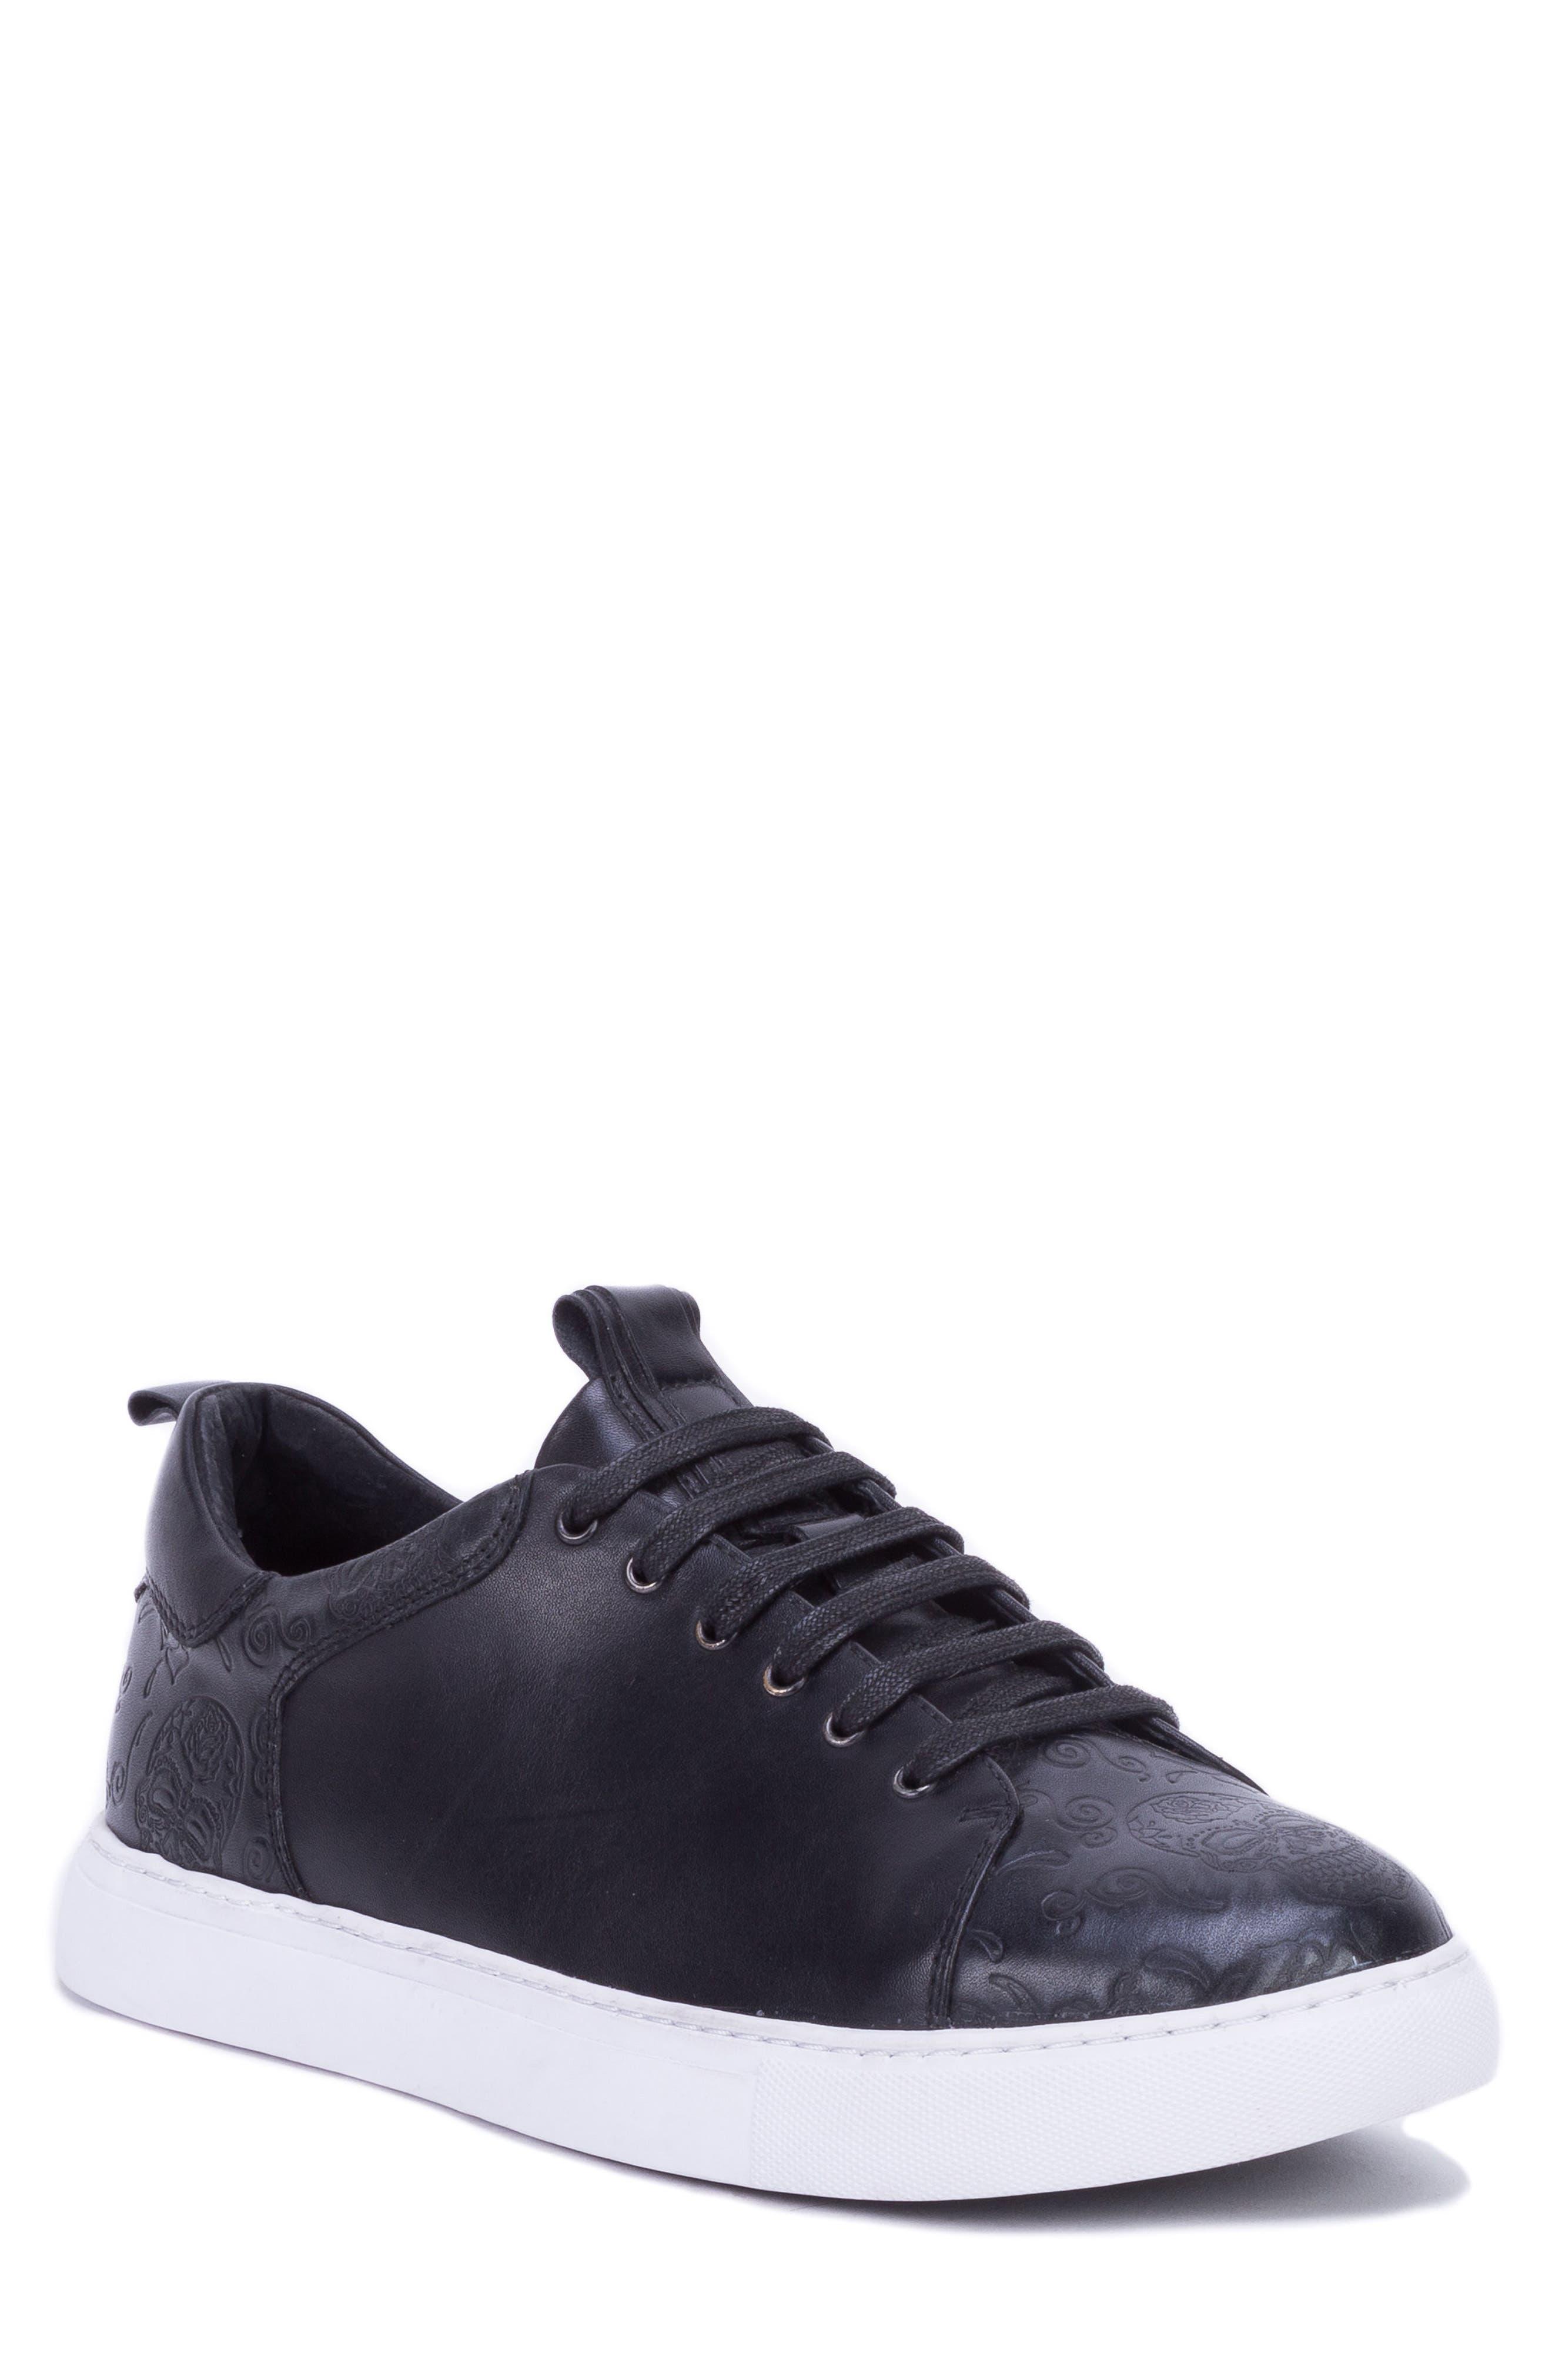 Sanderson Embossed Sneaker,                         Main,                         color, BLACK LEATHER